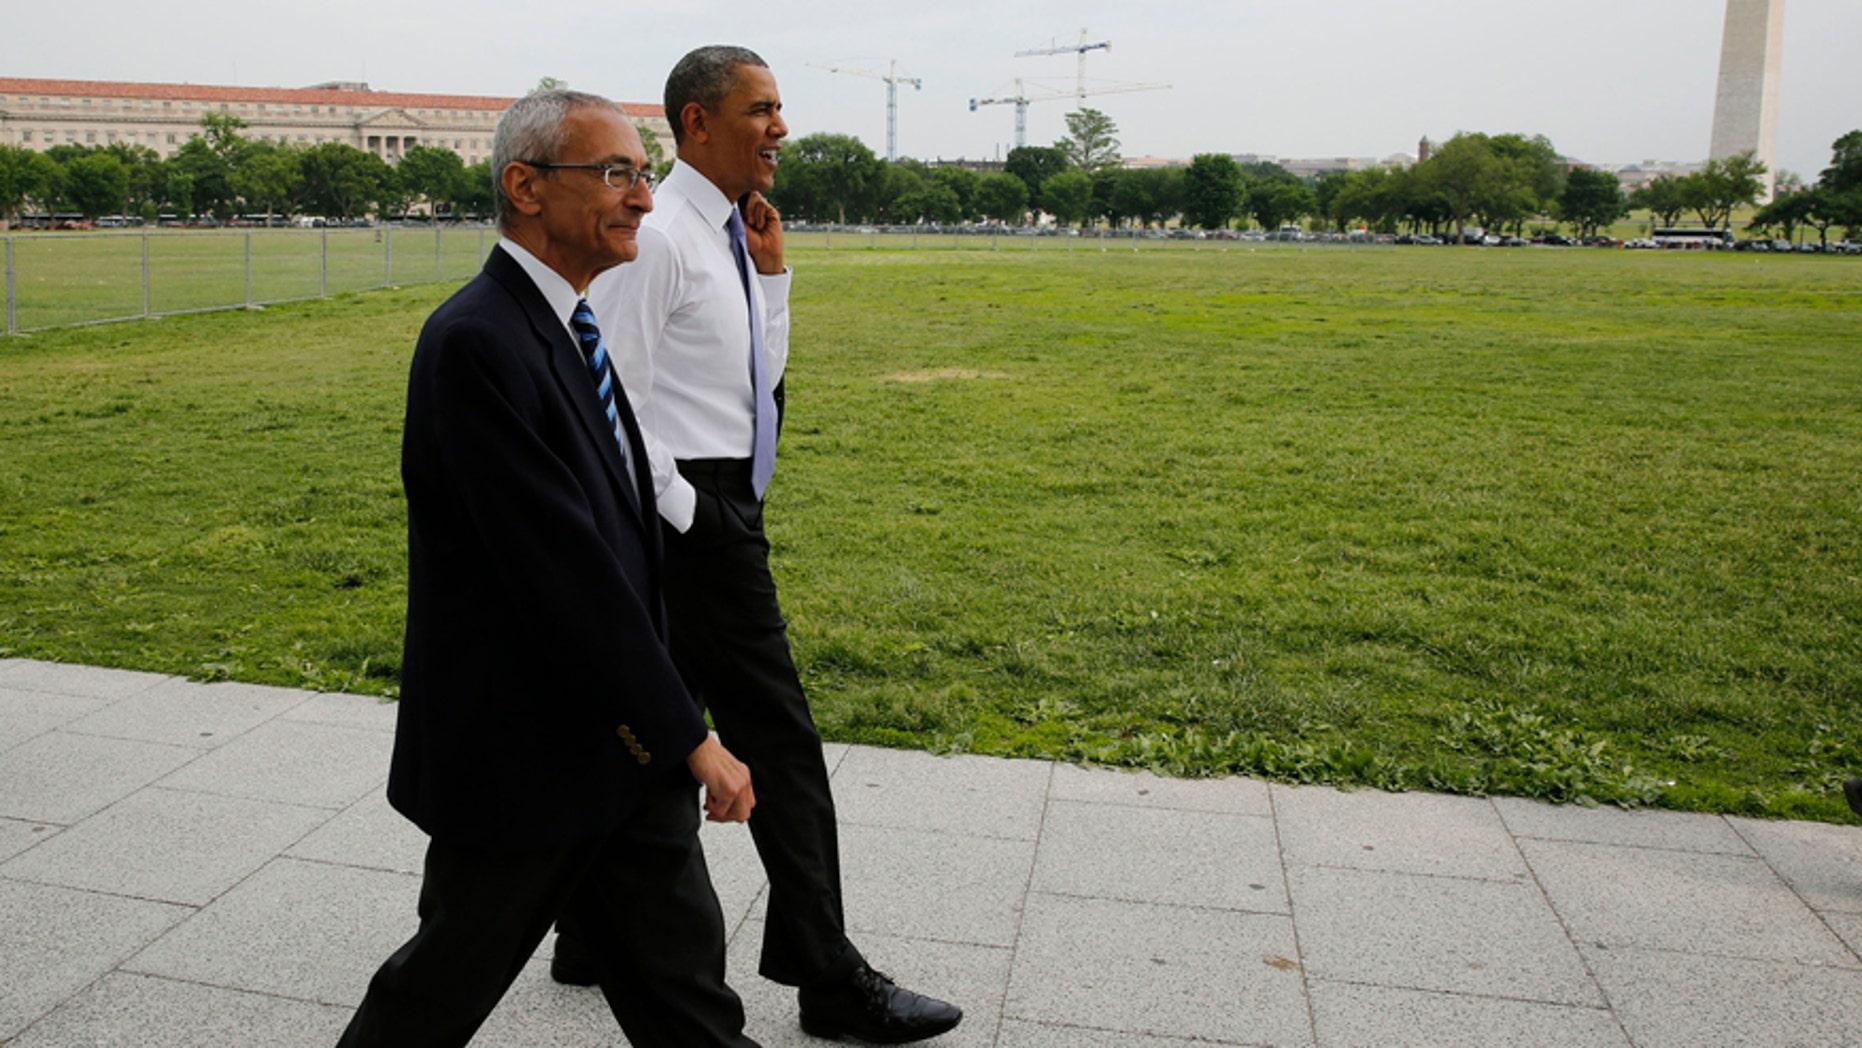 U.S. President Barack Obama walks on the Ellipse with White House counselor John Podesta near the White House in Washington May 21, 2014.